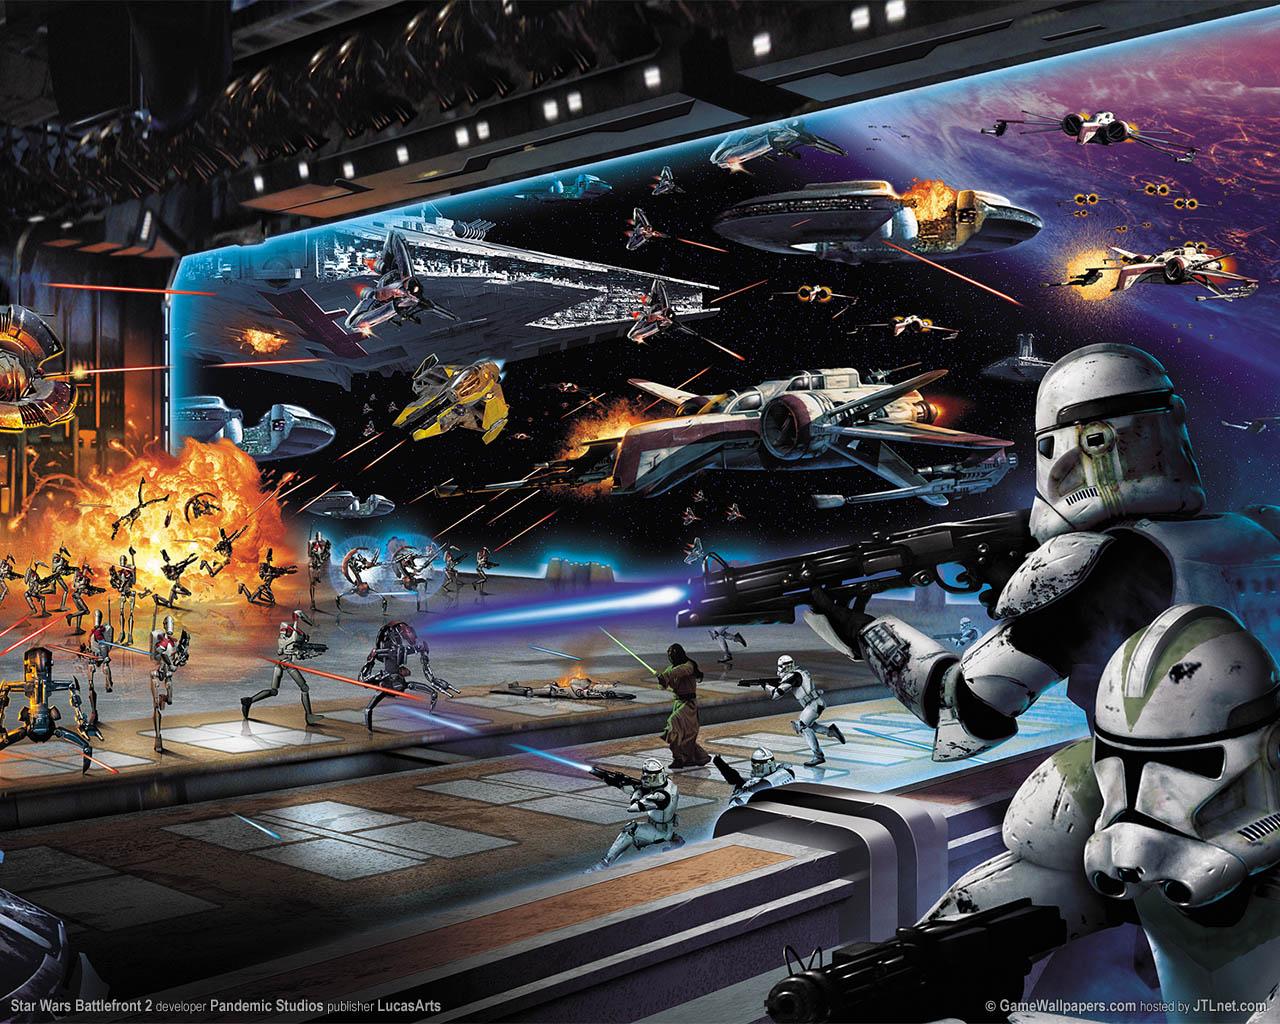 star wars battle wallpaper Star Wars Wallpaper 1280x1024